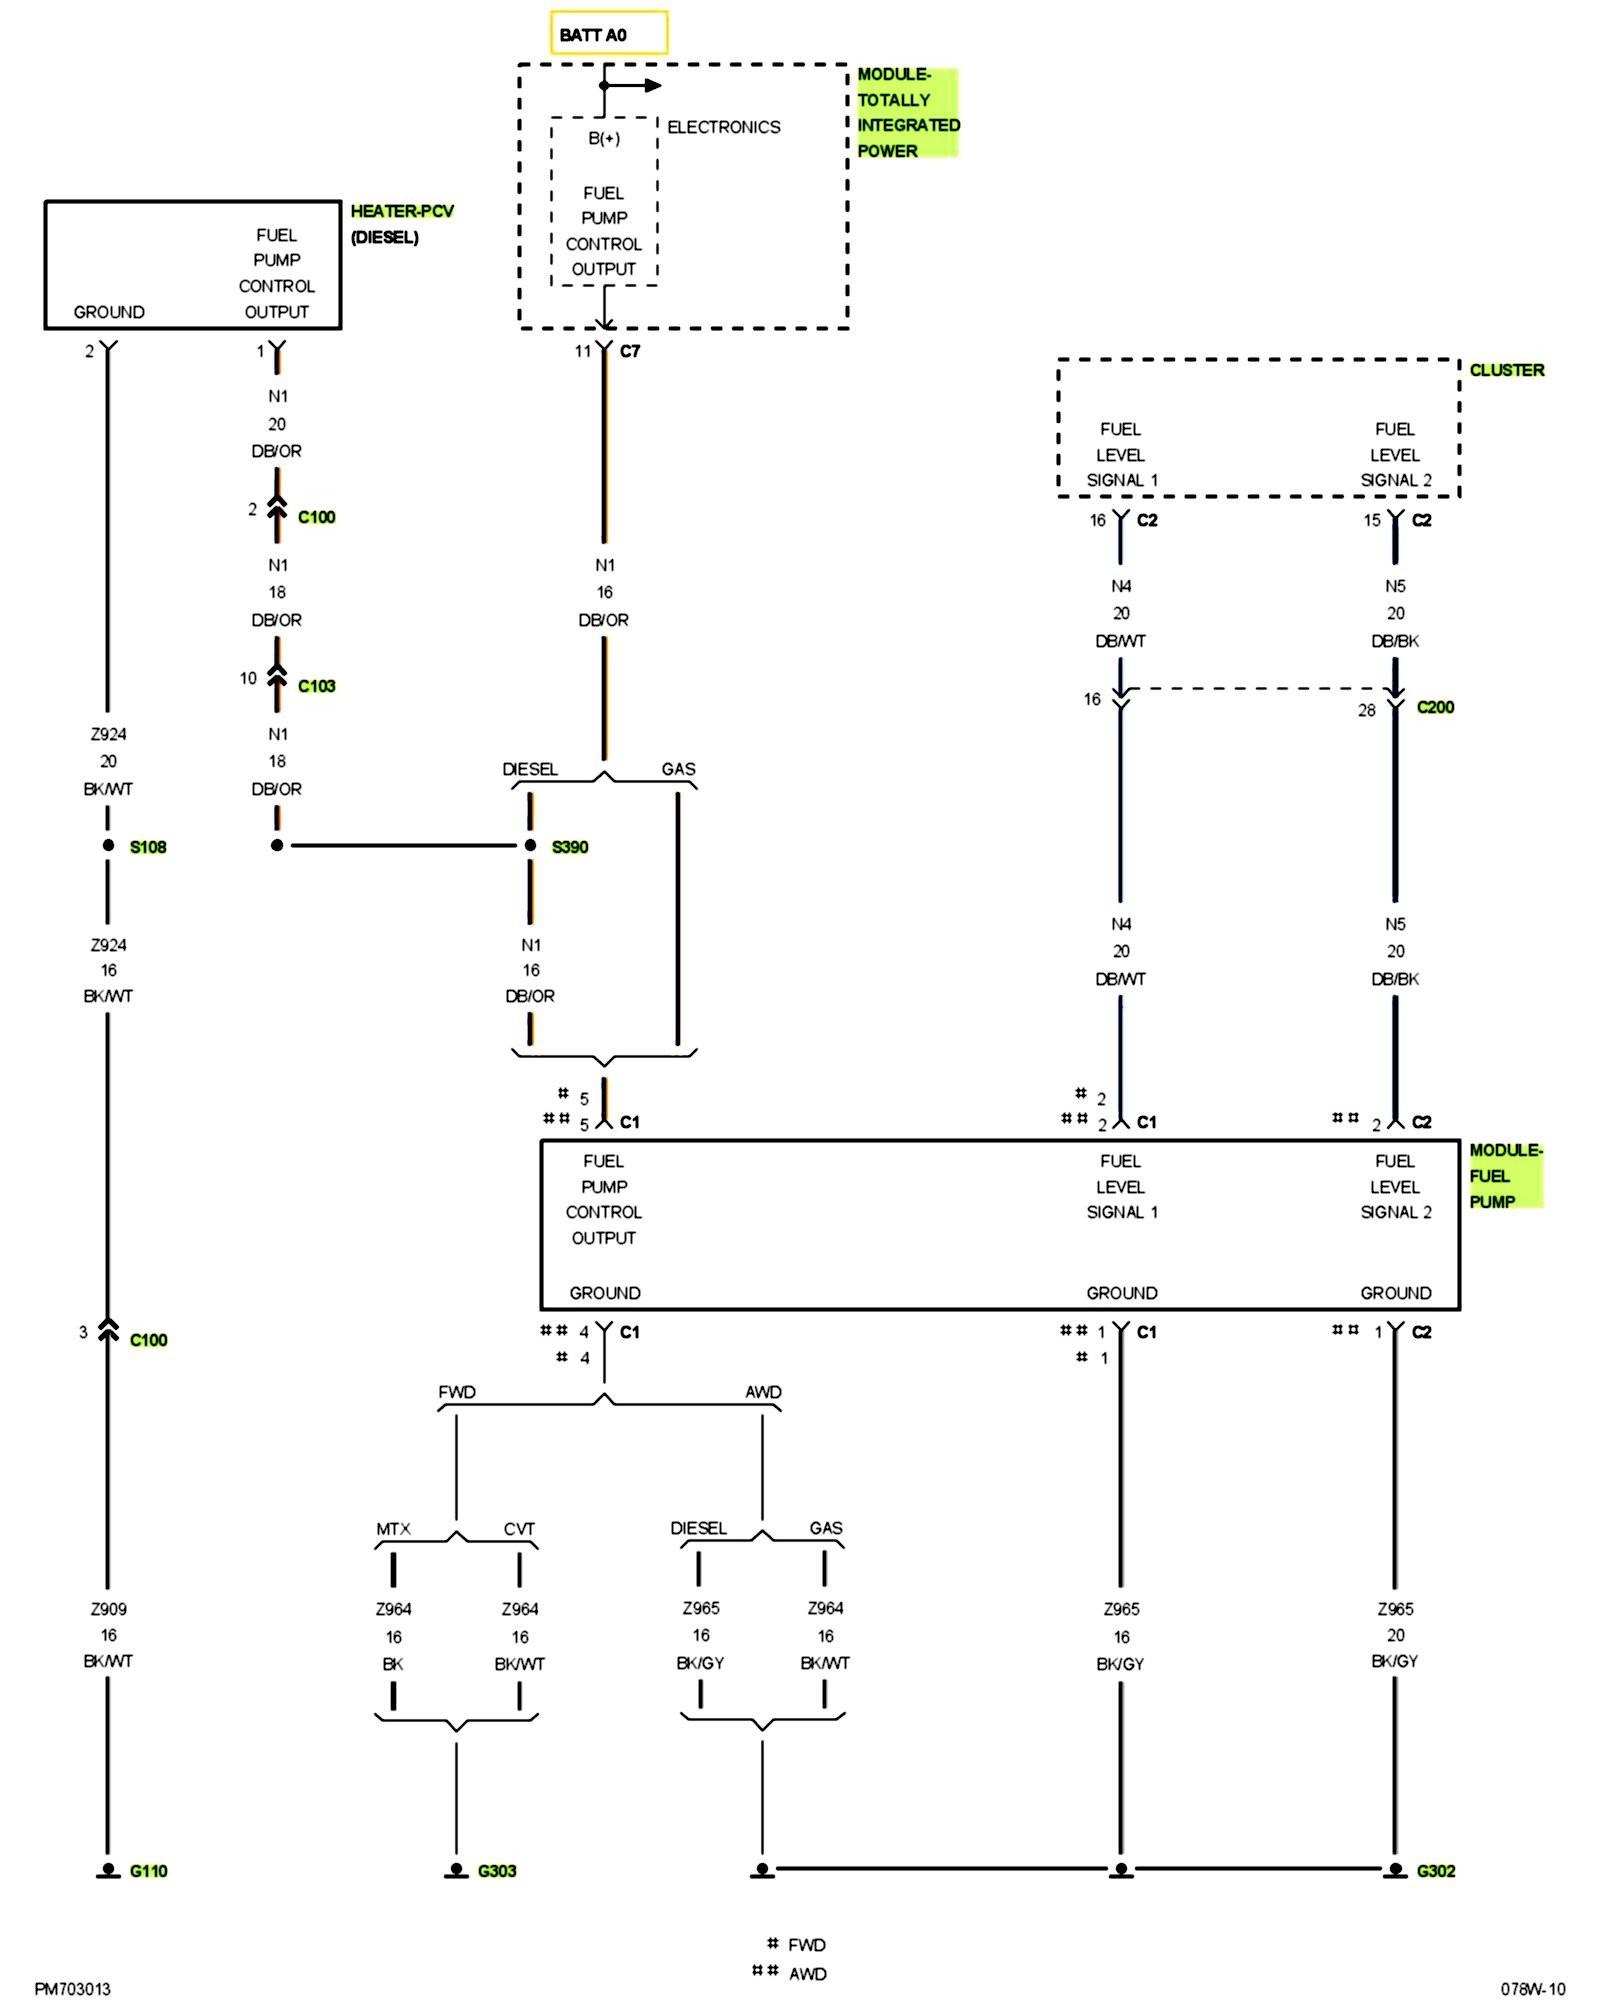 2003 dodge ram 1500 window wiring diagram ford focus zetec engine 2007 library